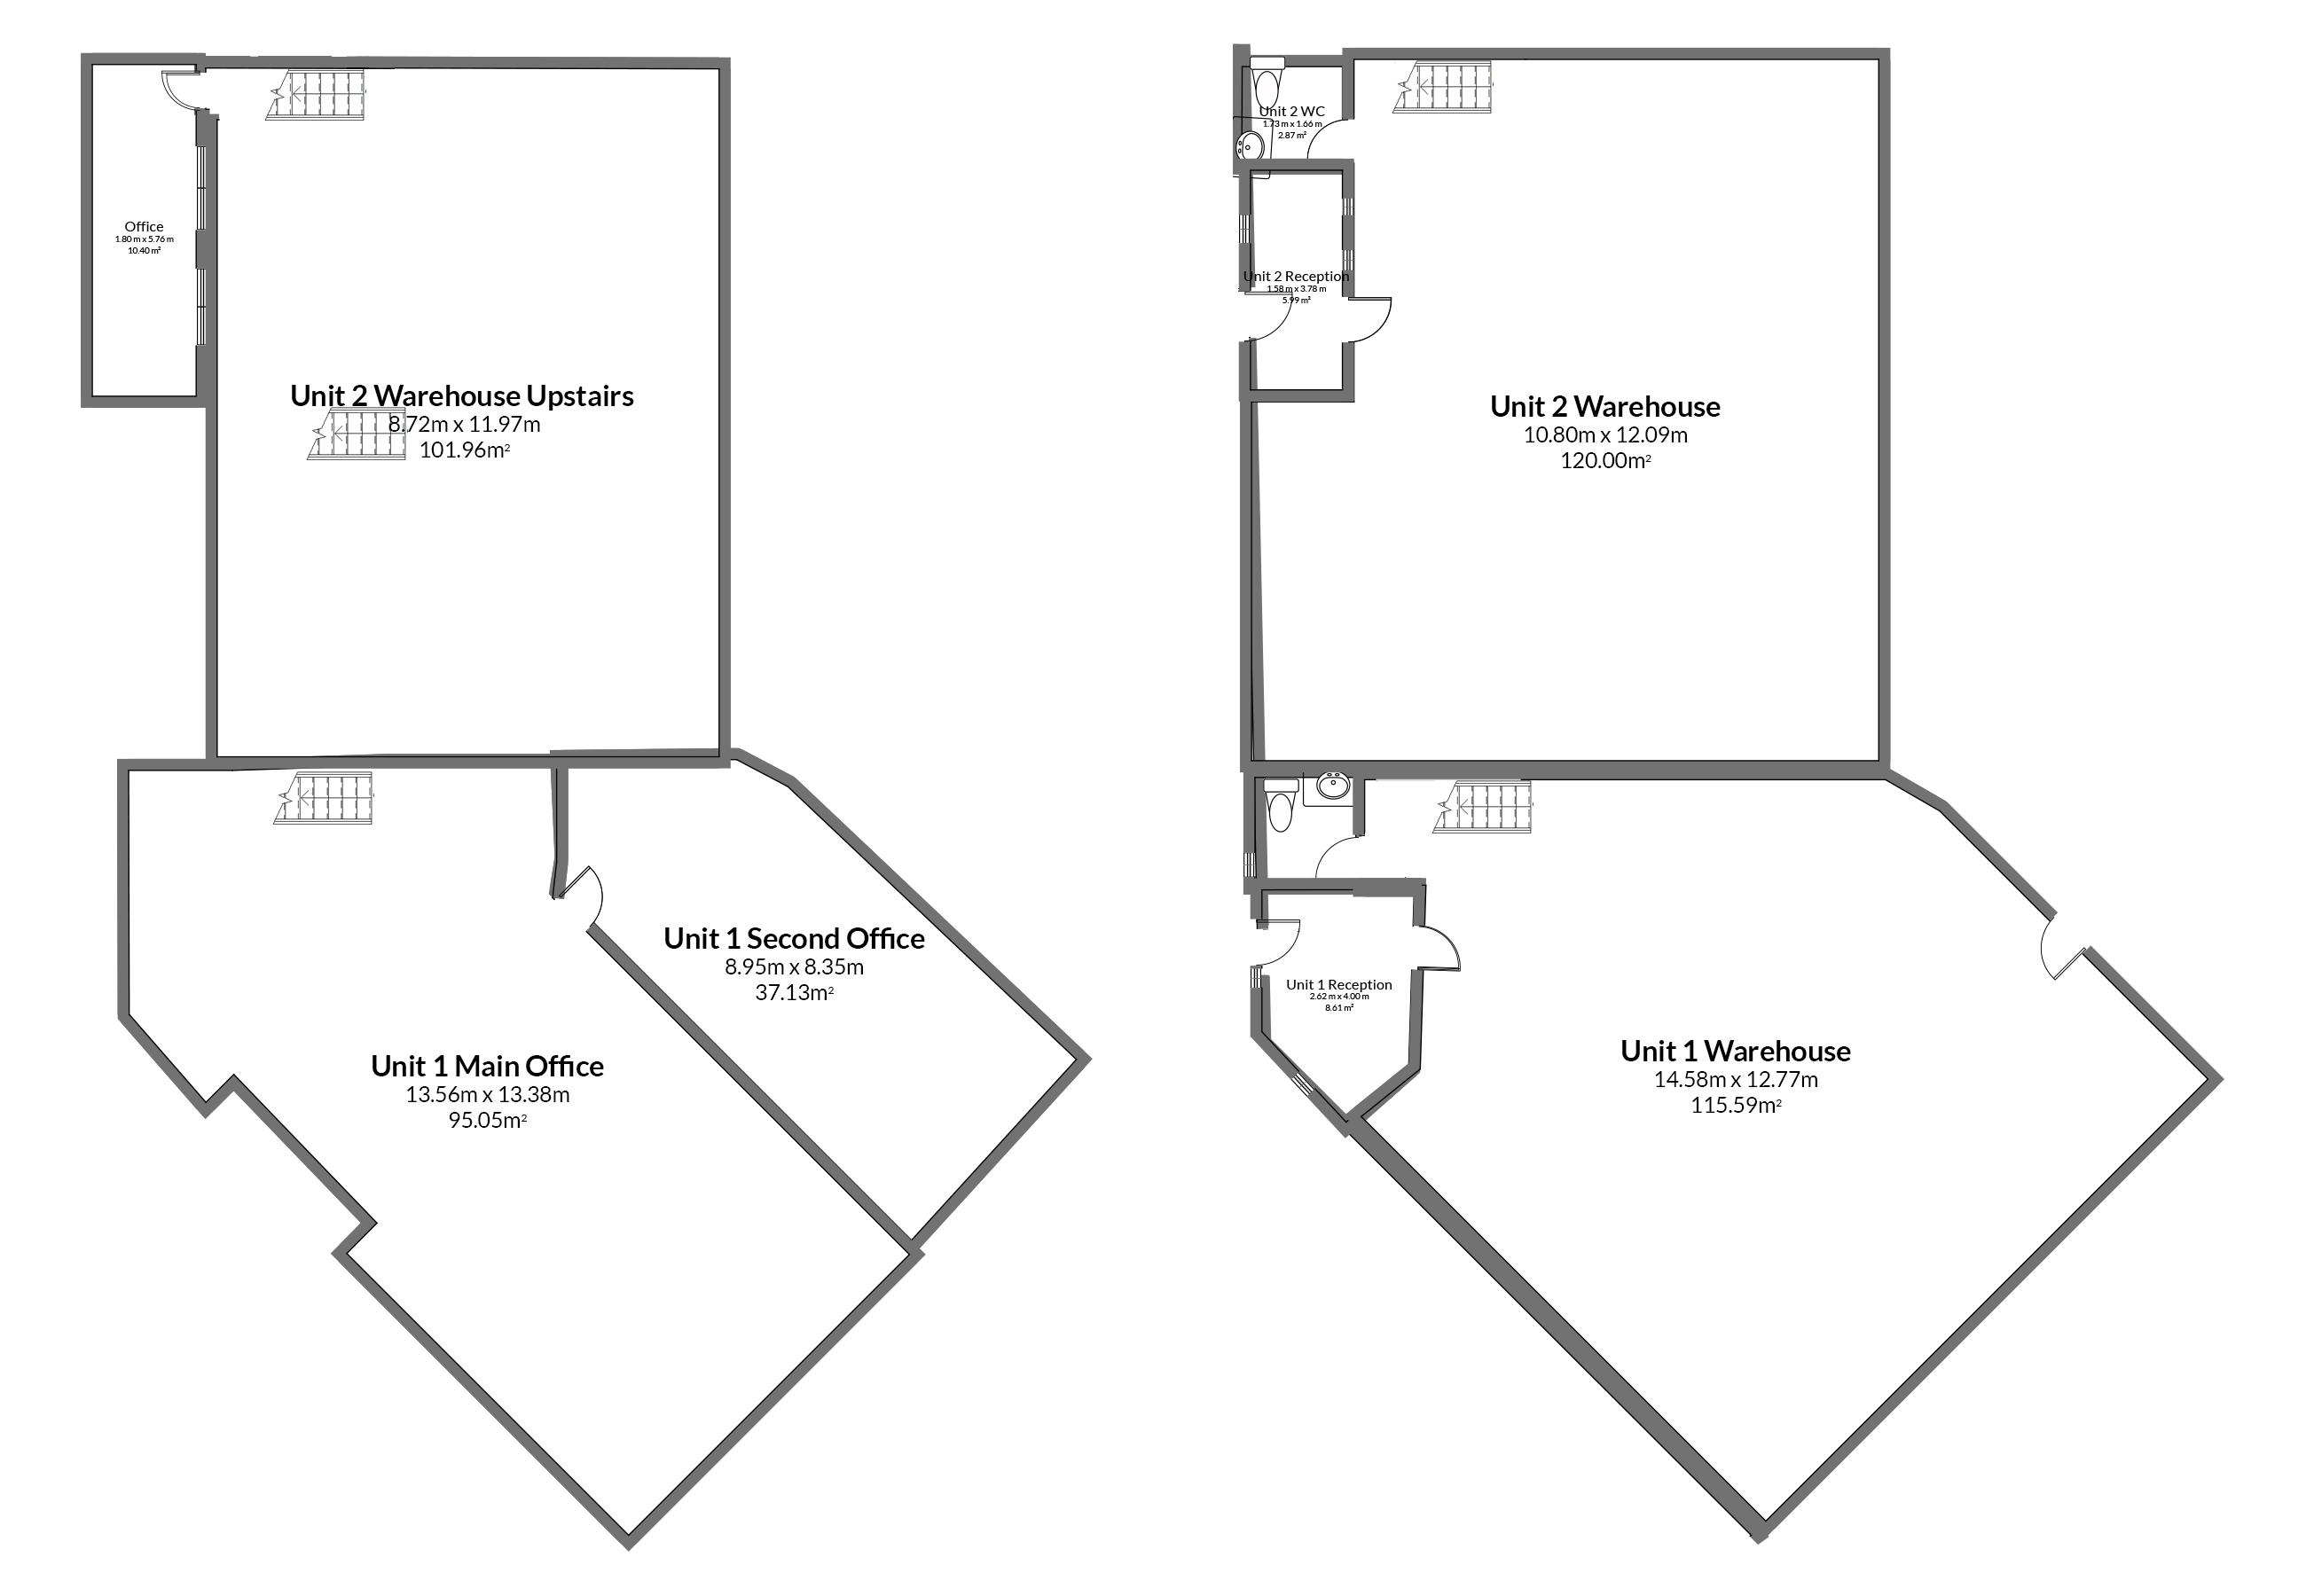 Floorplan for 80 North Road, Yate.